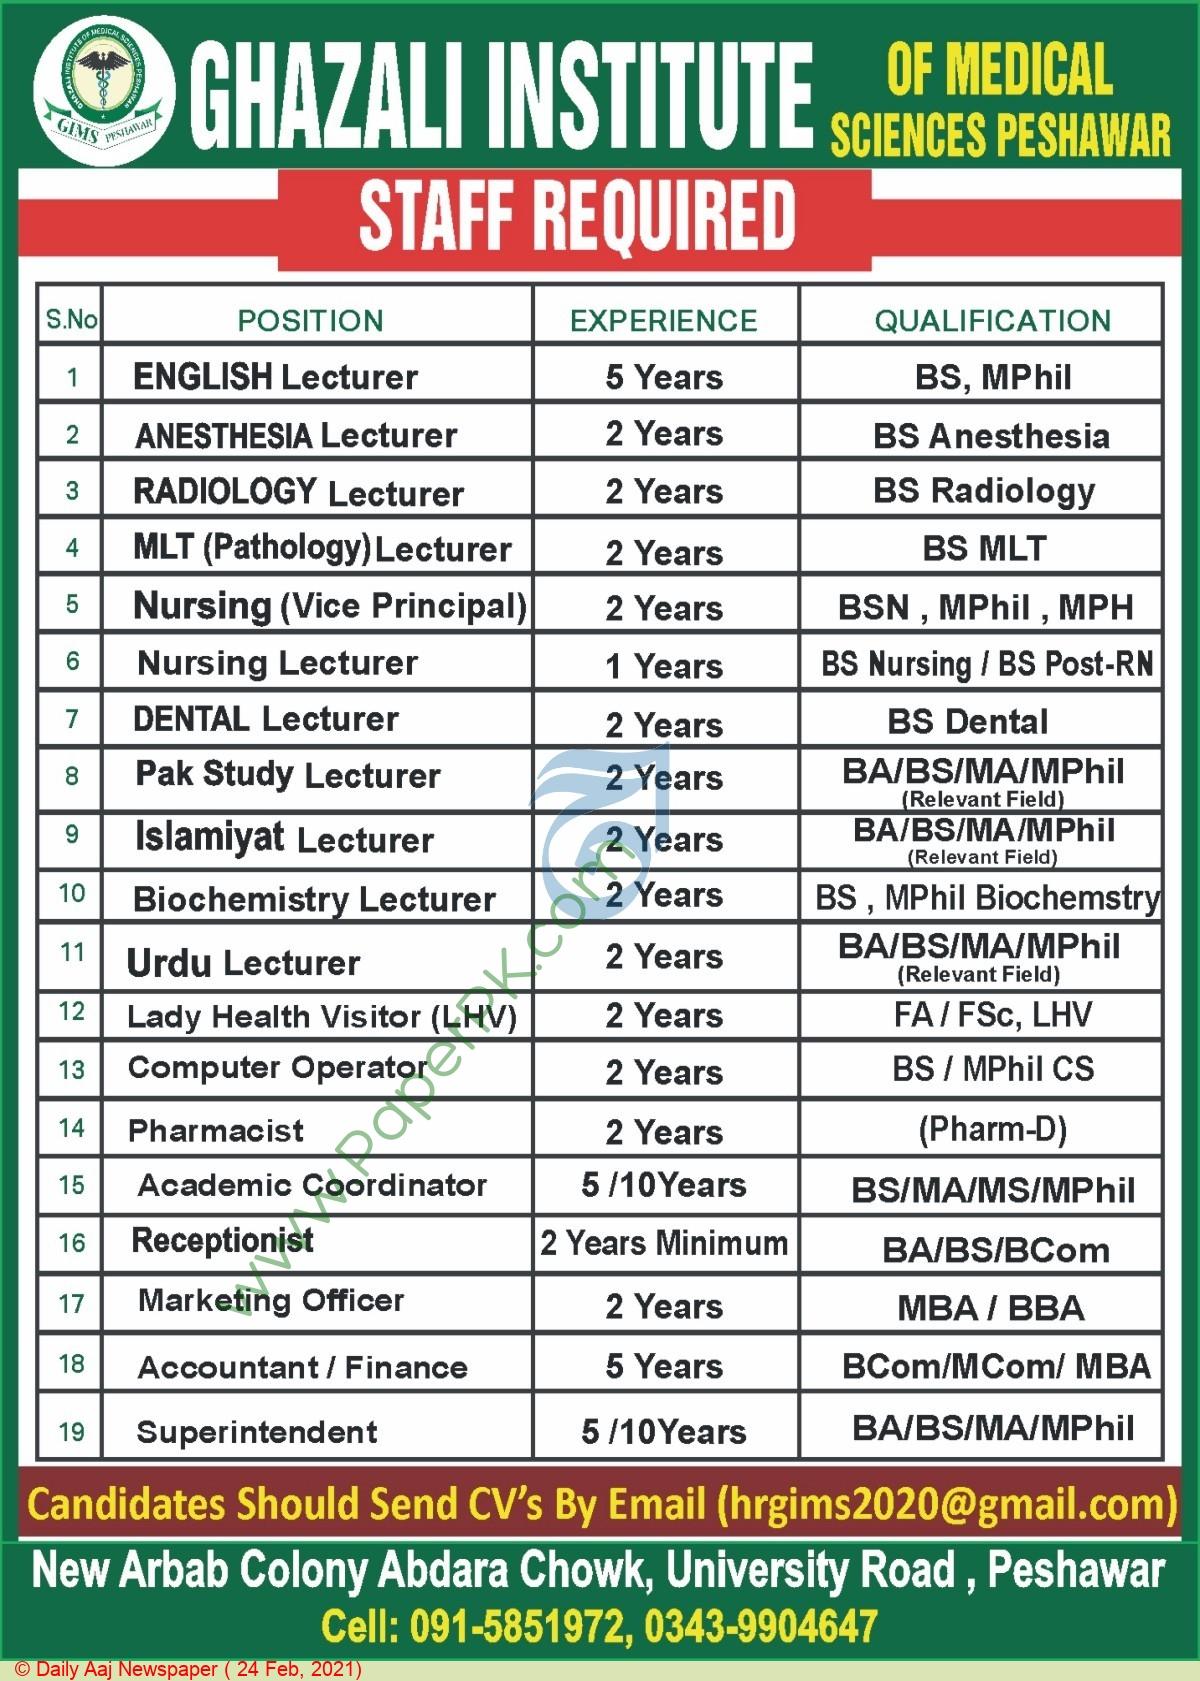 Ghazali Institute Of Medical Sciences jobs newspaper ad for Pharmacist in Peshawar on 2021-02-24